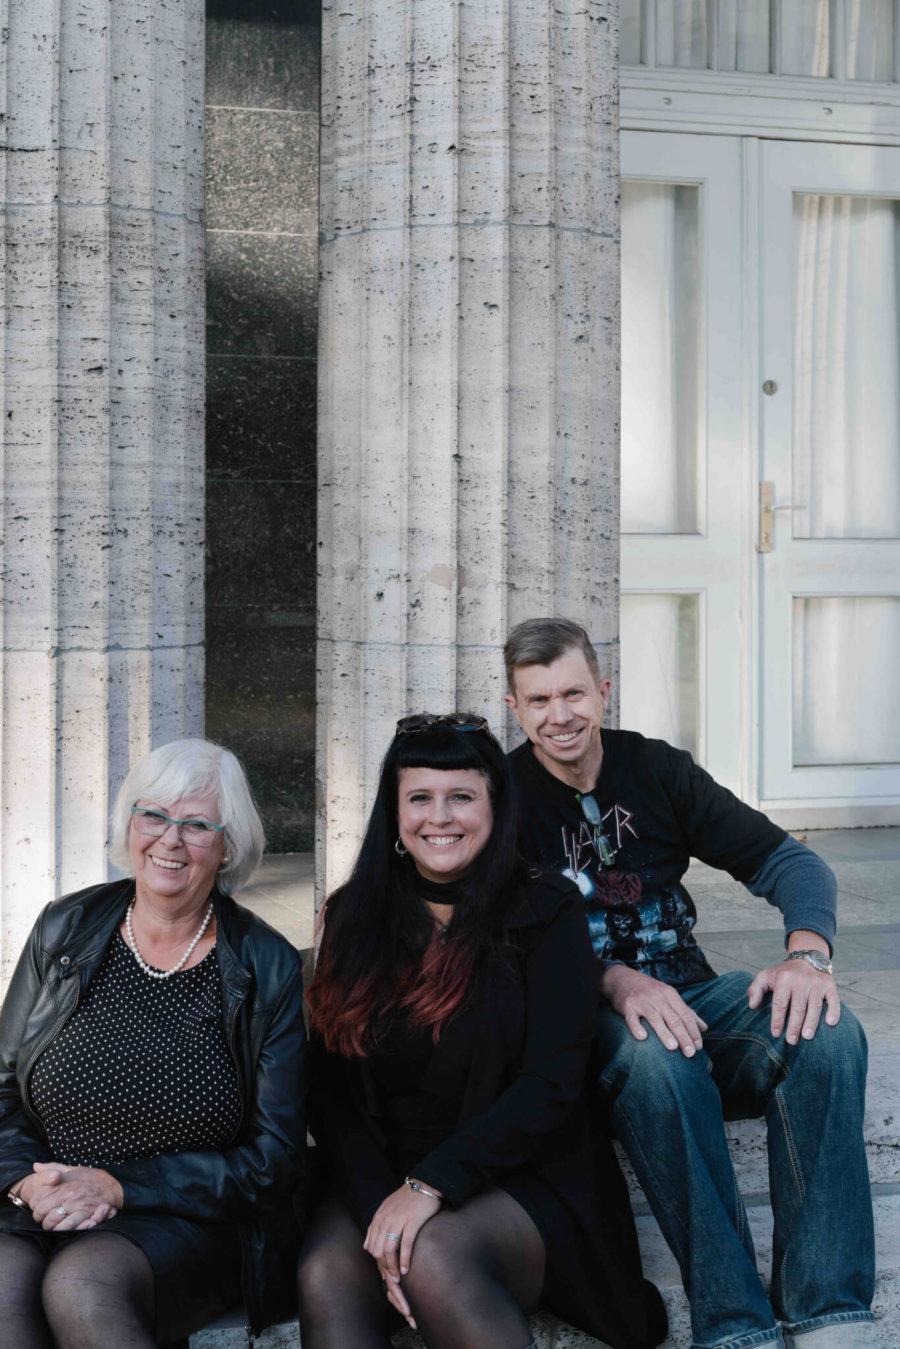 Veronika Sisolefsky(左)、Joyce Olivia Bernitt(中)和Kay Bernitt(右) 在卡爾.馬克思大街合照,他們一直住在東柏林。